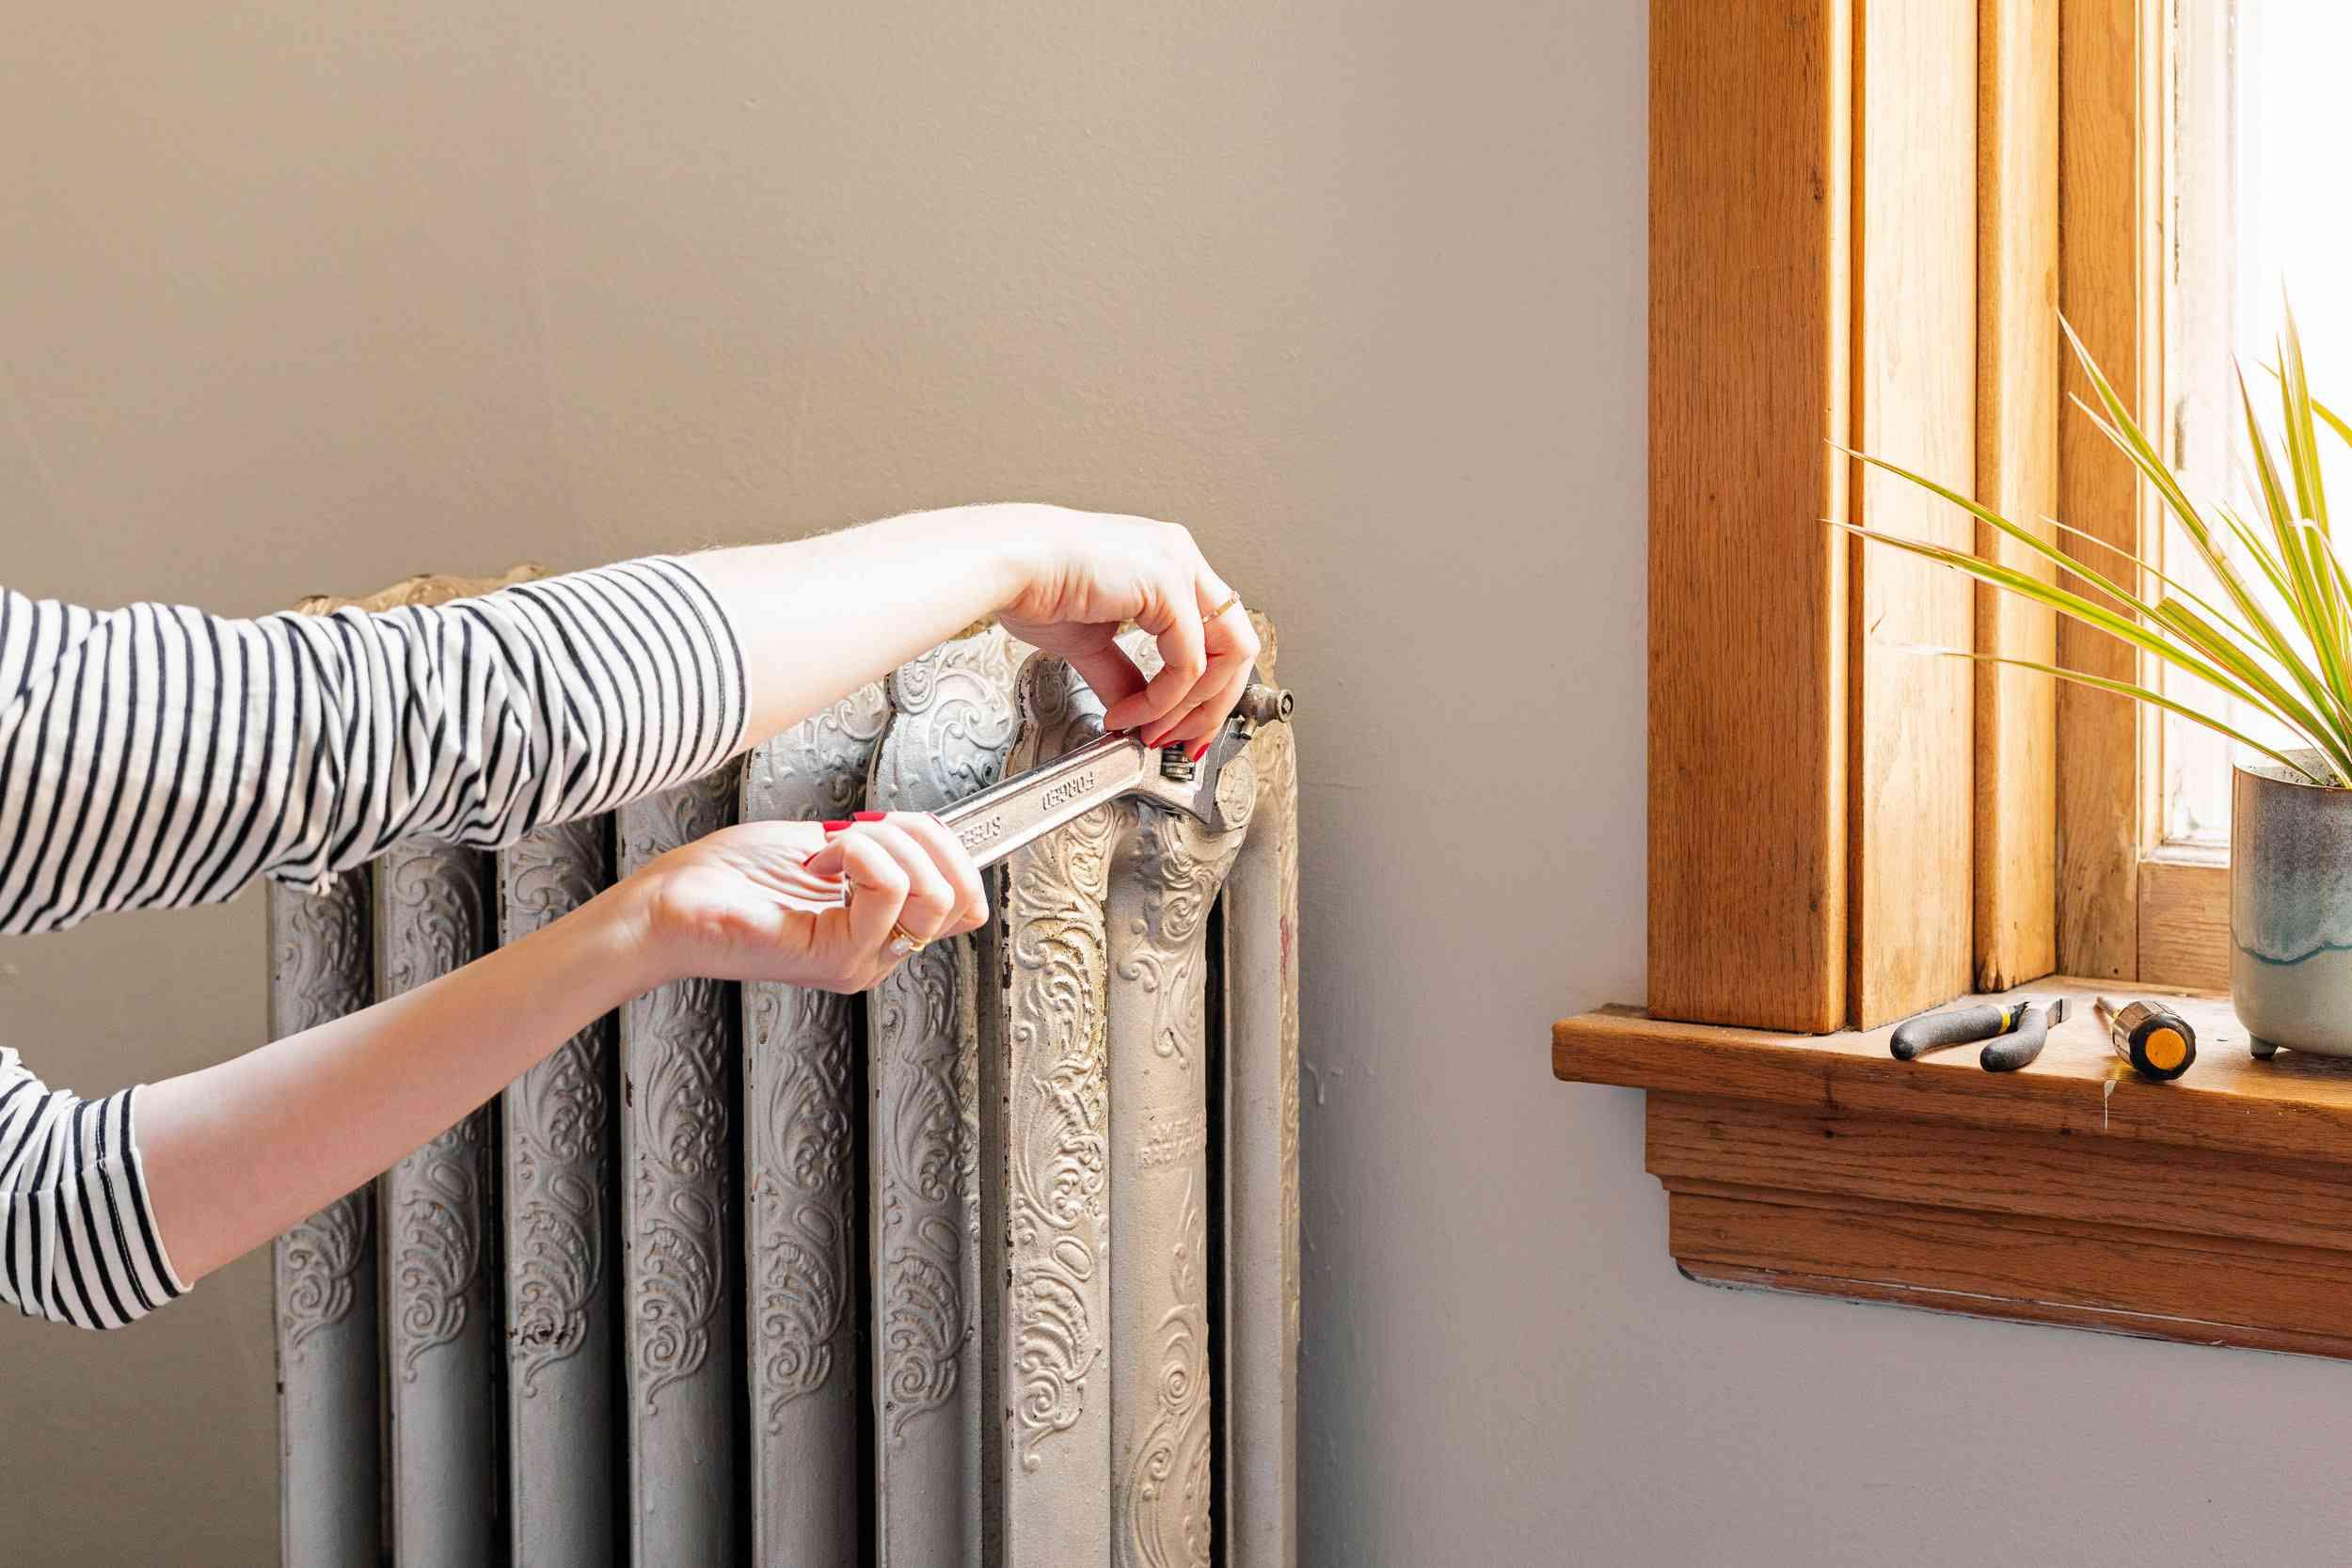 person performing radiator maintenance